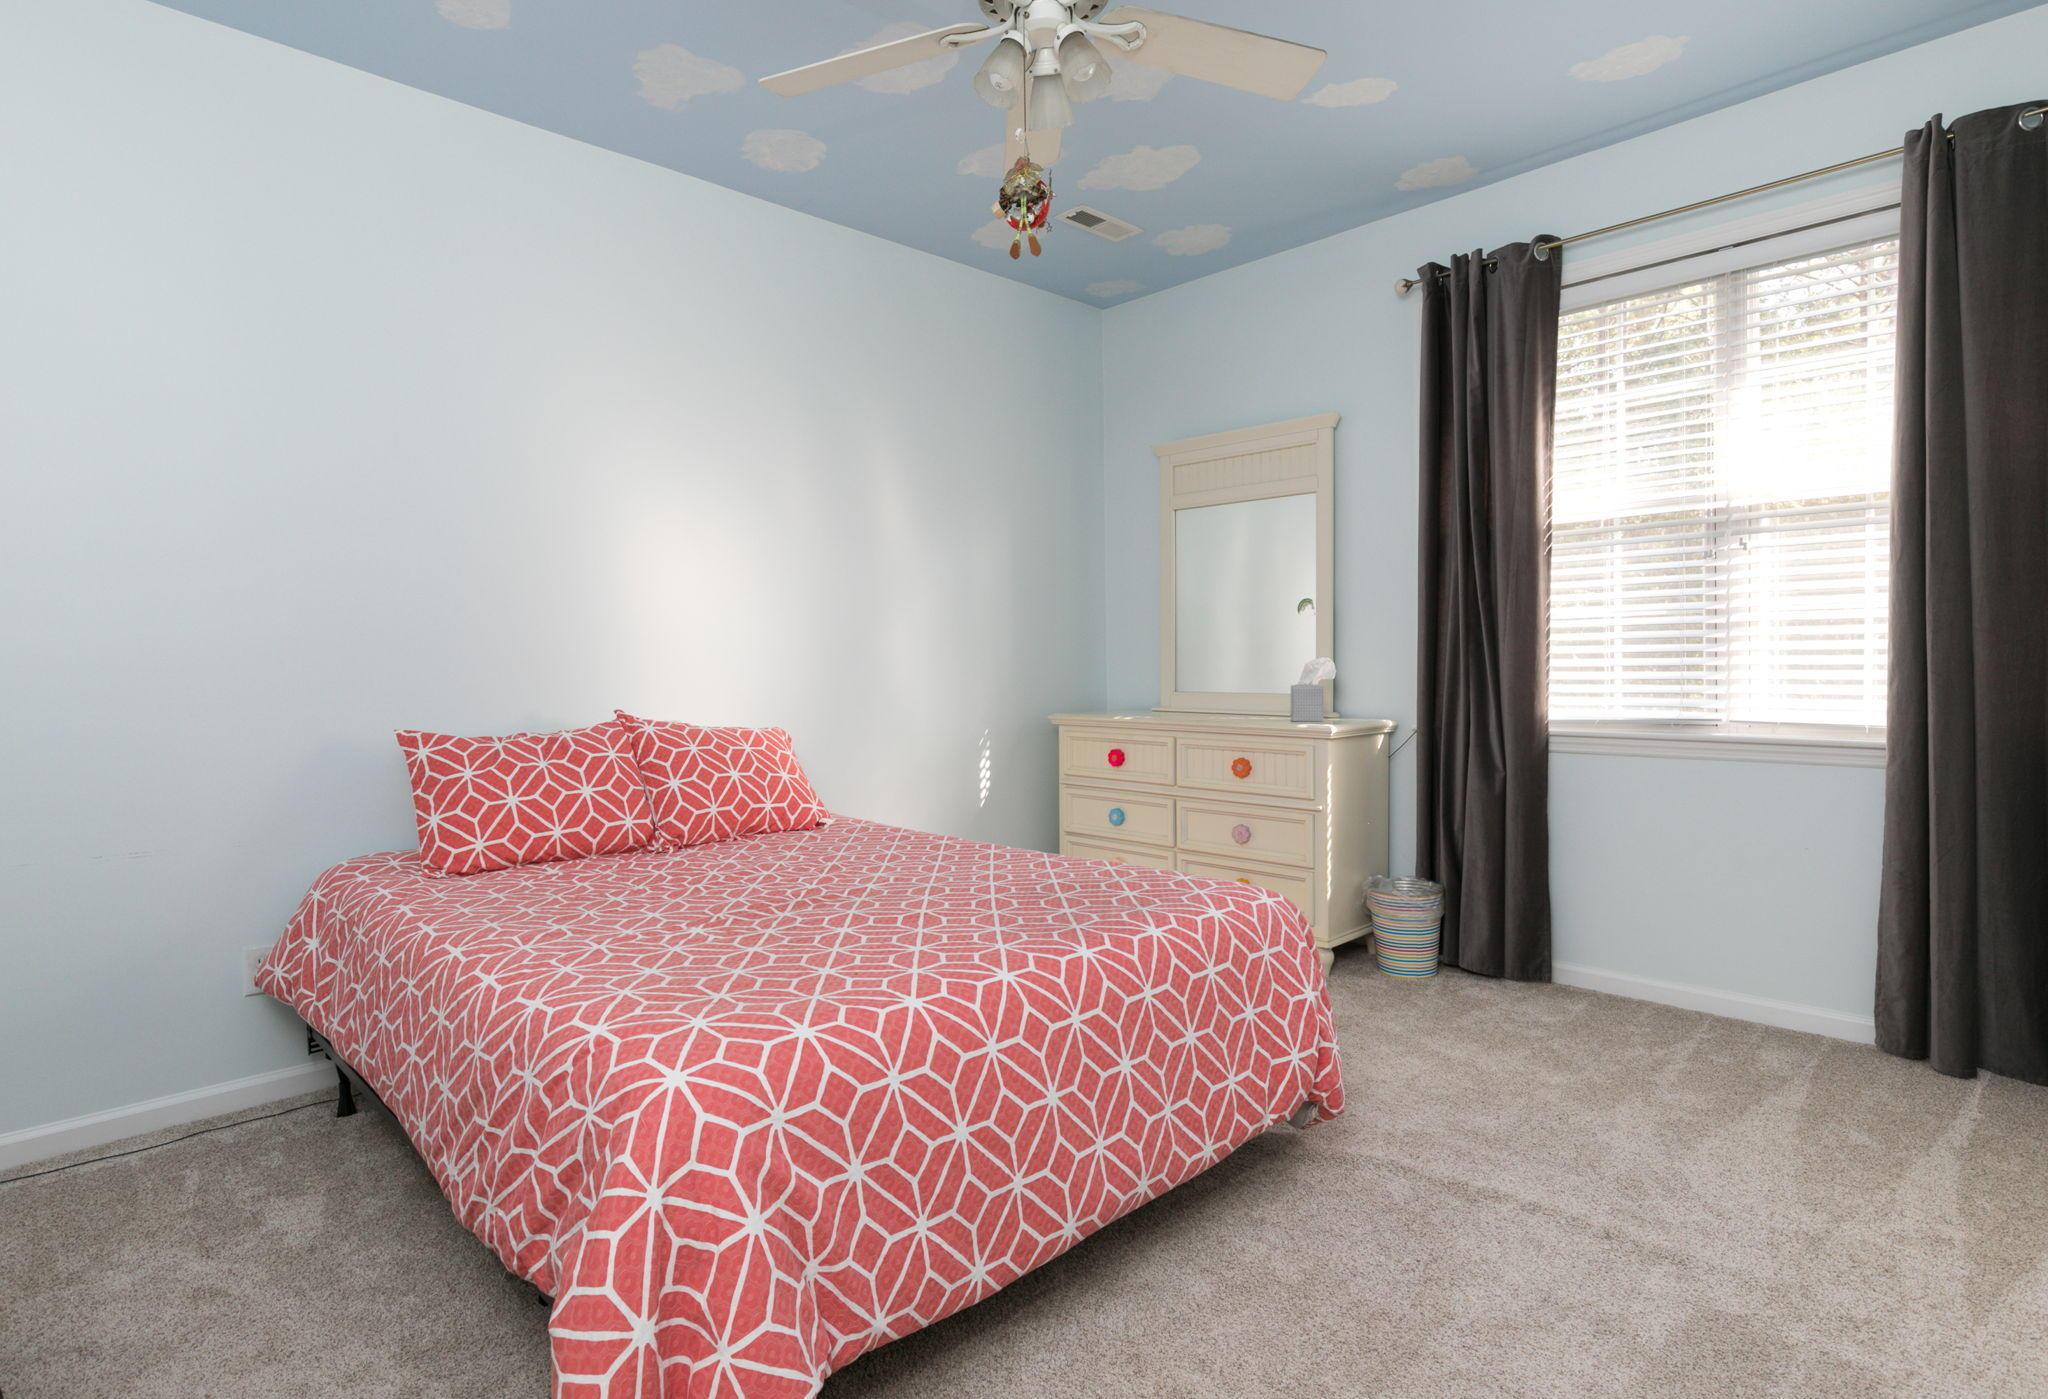 Dunes West Homes For Sale - 3625 Colonel Vanderhorst, Mount Pleasant, SC - 11